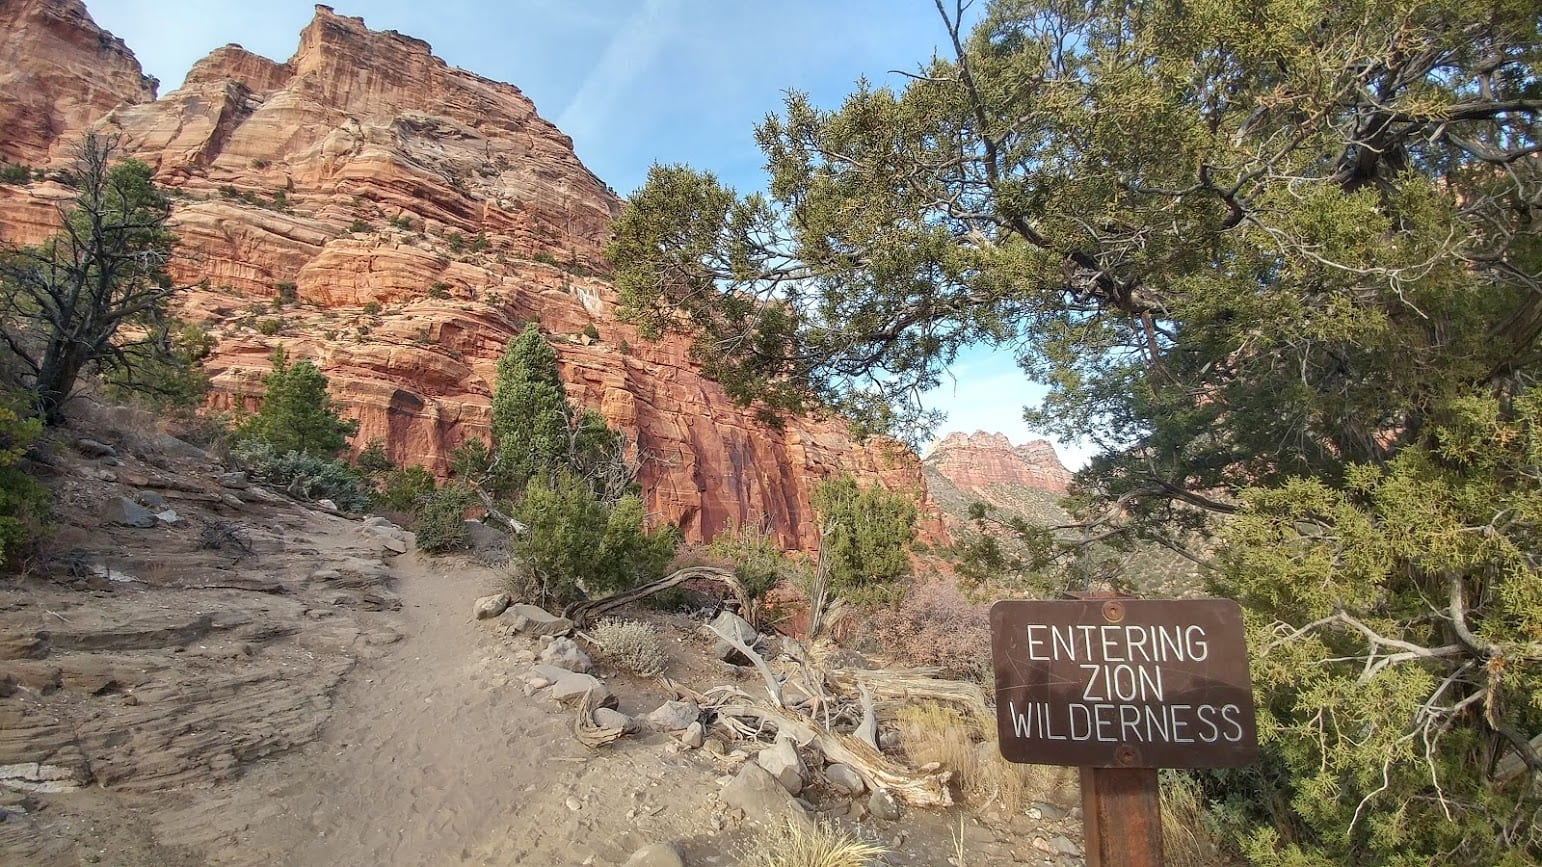 Zion adventures